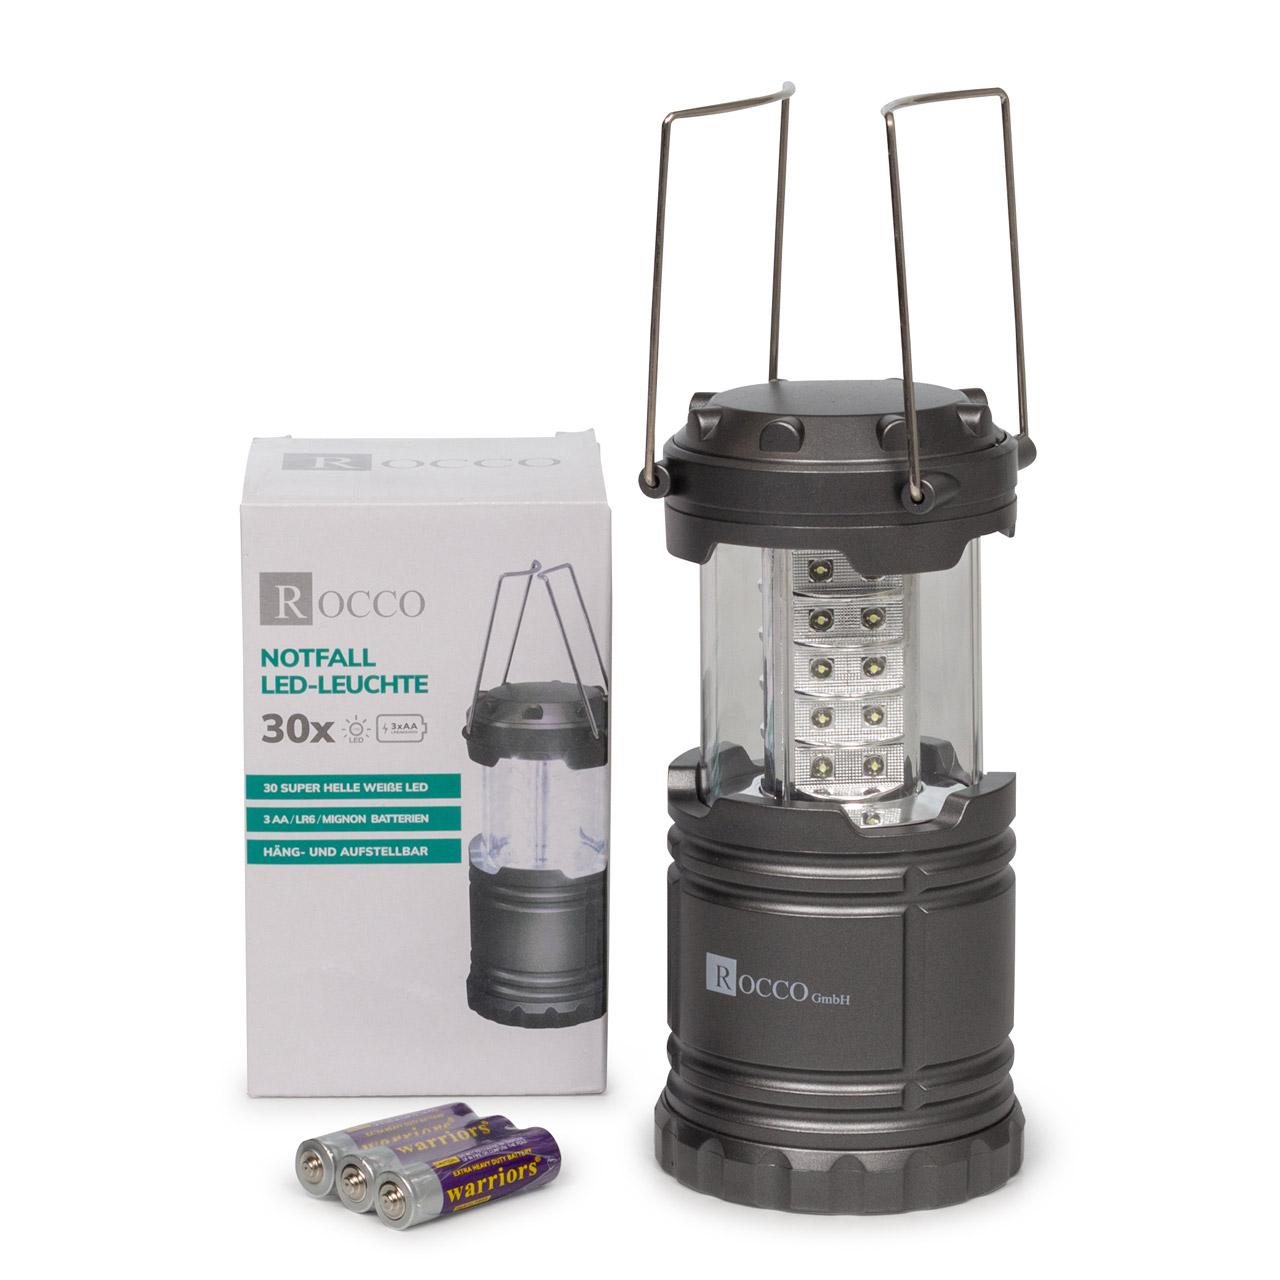 ROCCO Notfallleuchte LED-Leuchte Arbeitsleuchte Mobile LED Batteriebetrieben